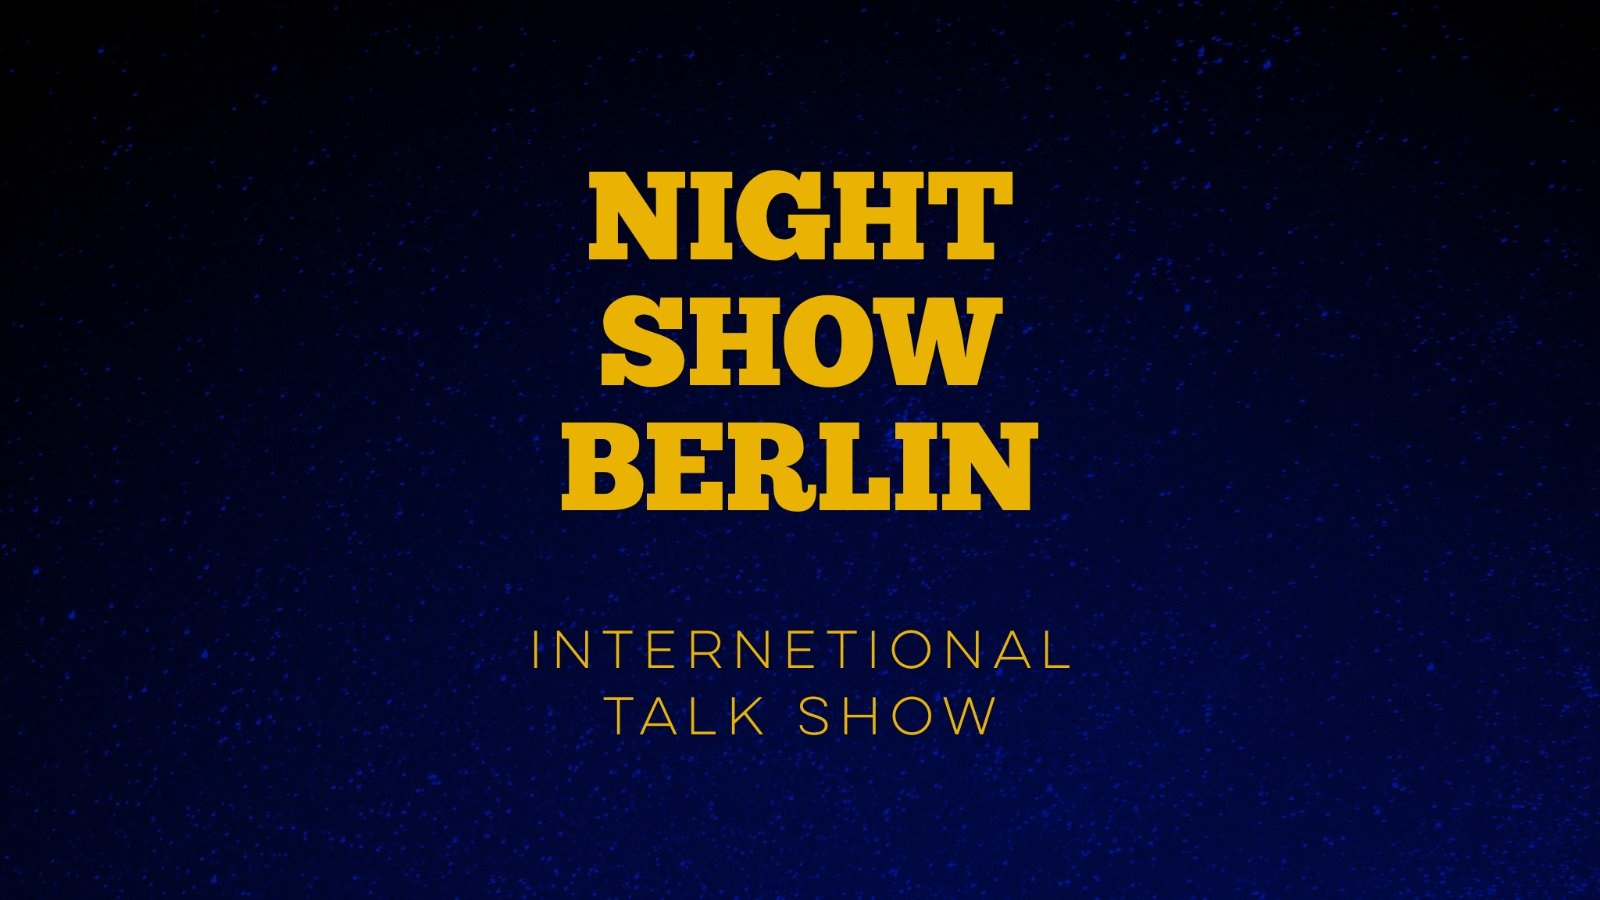 Night Show Berlin